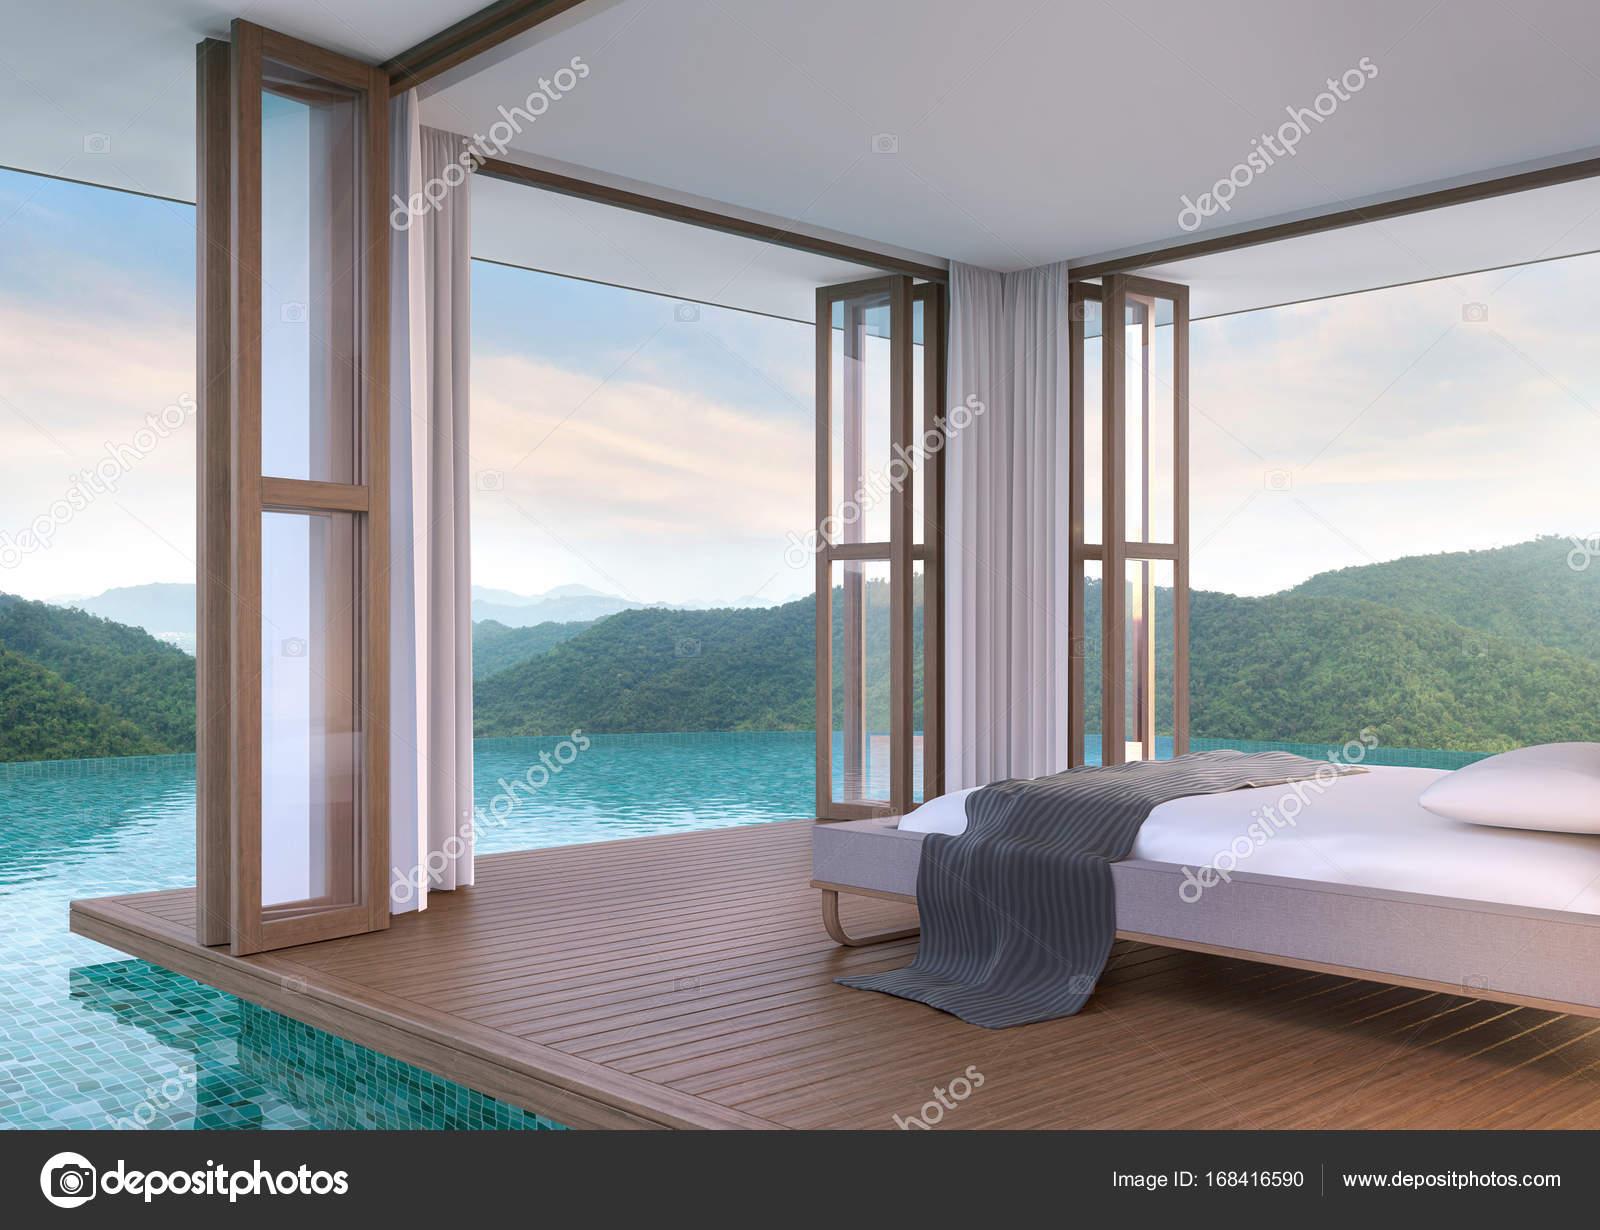 https://st3.depositphotos.com/10806848/16841/i/1600/depositphotos_168416590-stock-photo-pool-villa-bedroom-with-mountain.jpg